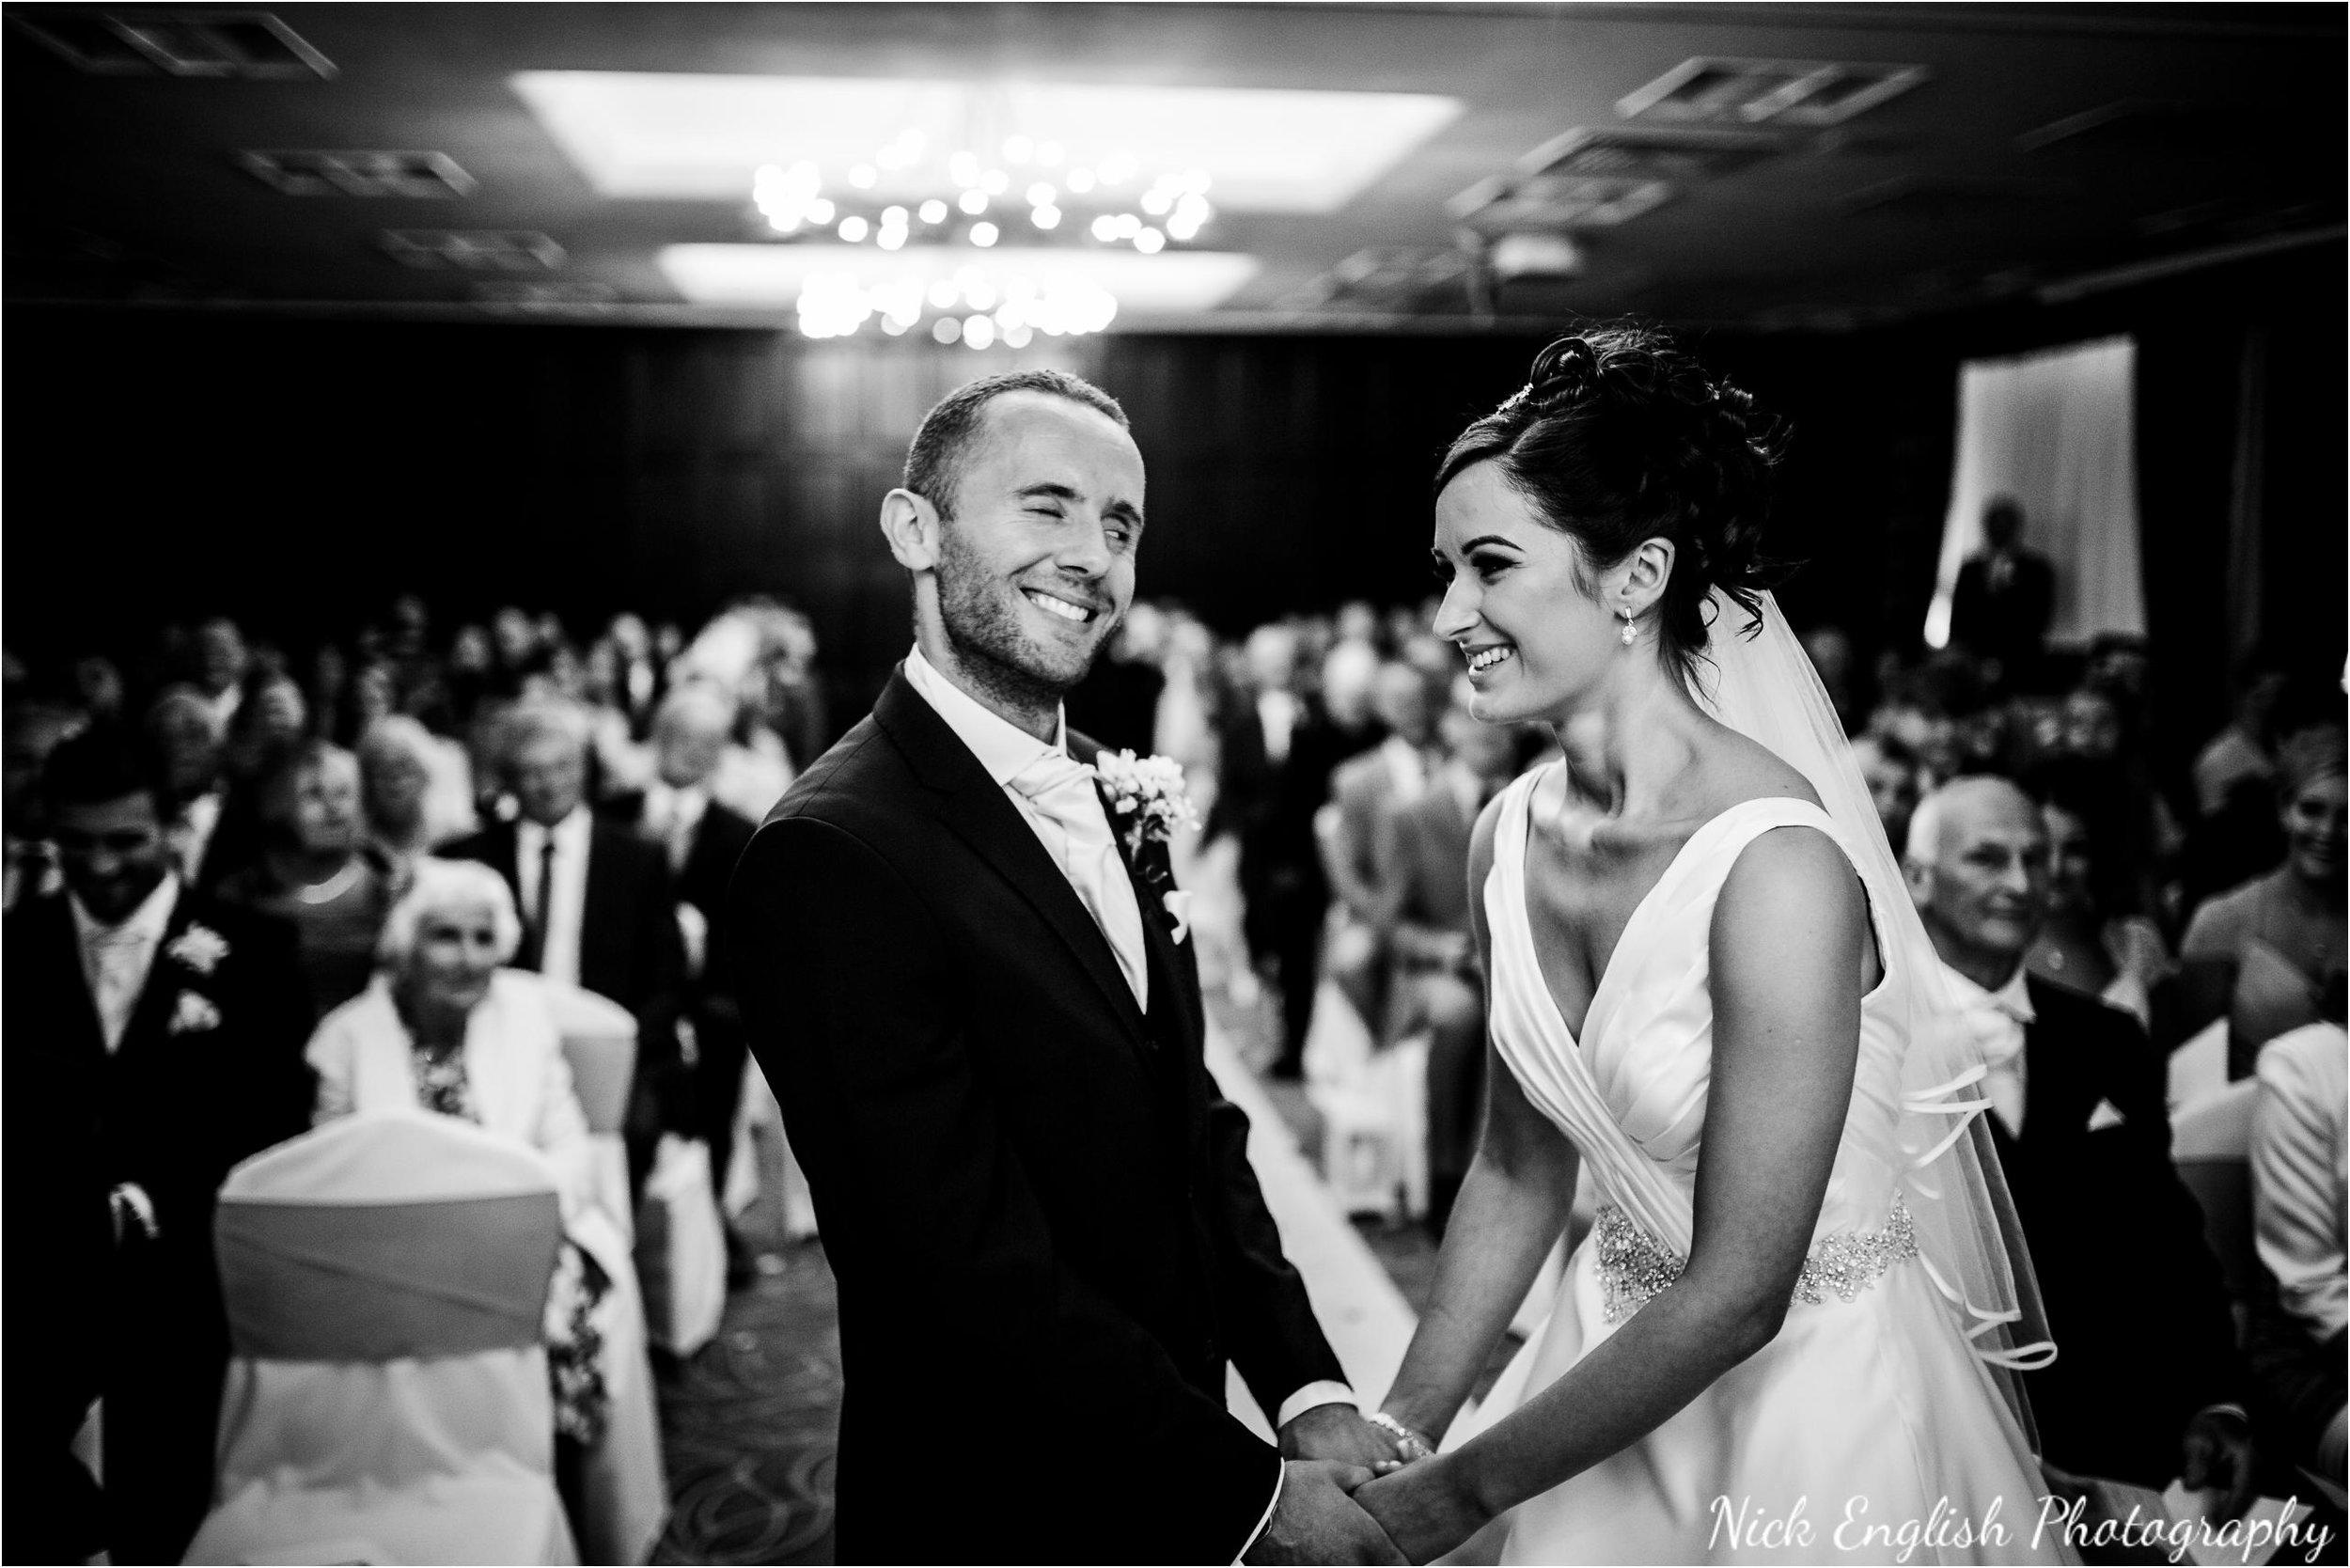 Emily David Wedding Photographs at Barton Grange Preston by Nick English Photography 65jpg.jpeg